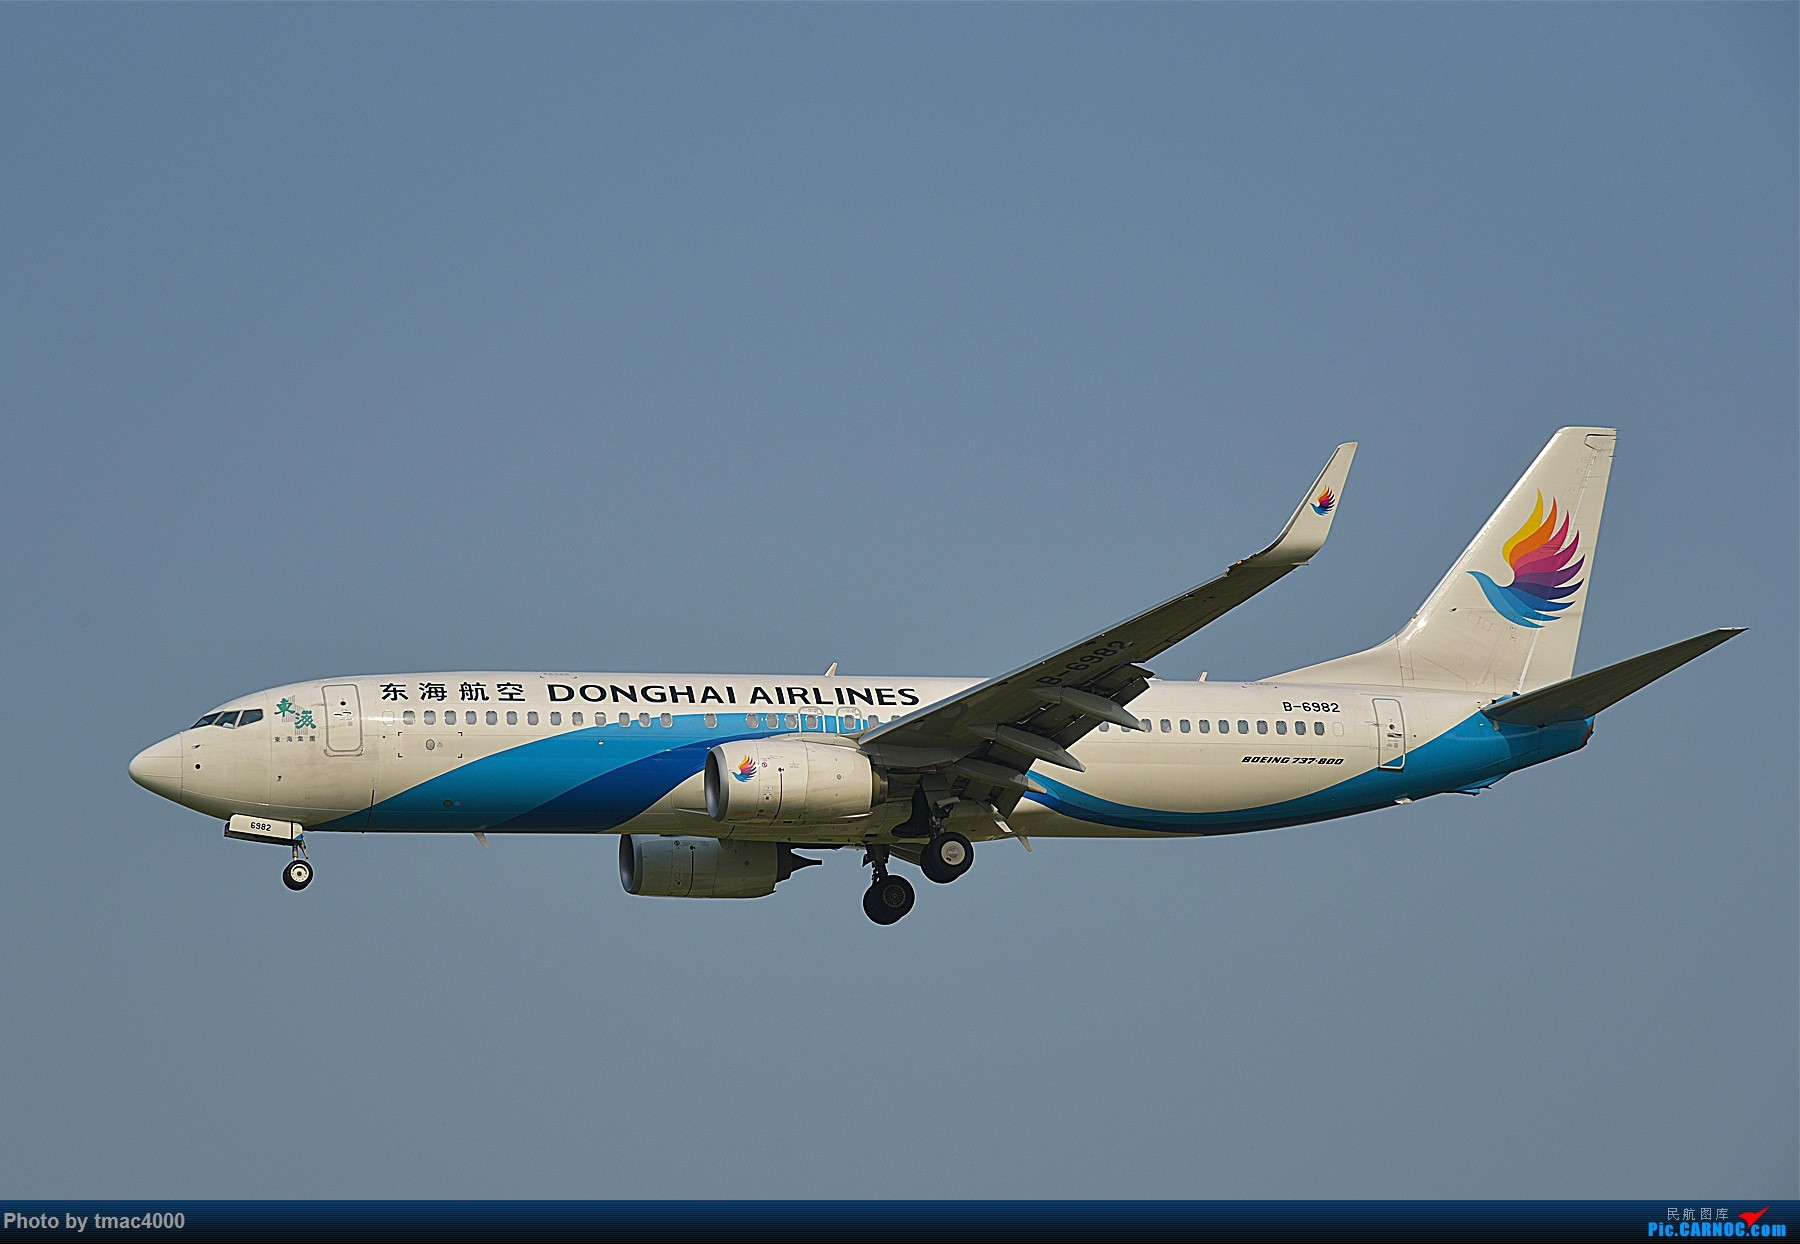 Boeing 737 Wikip dia